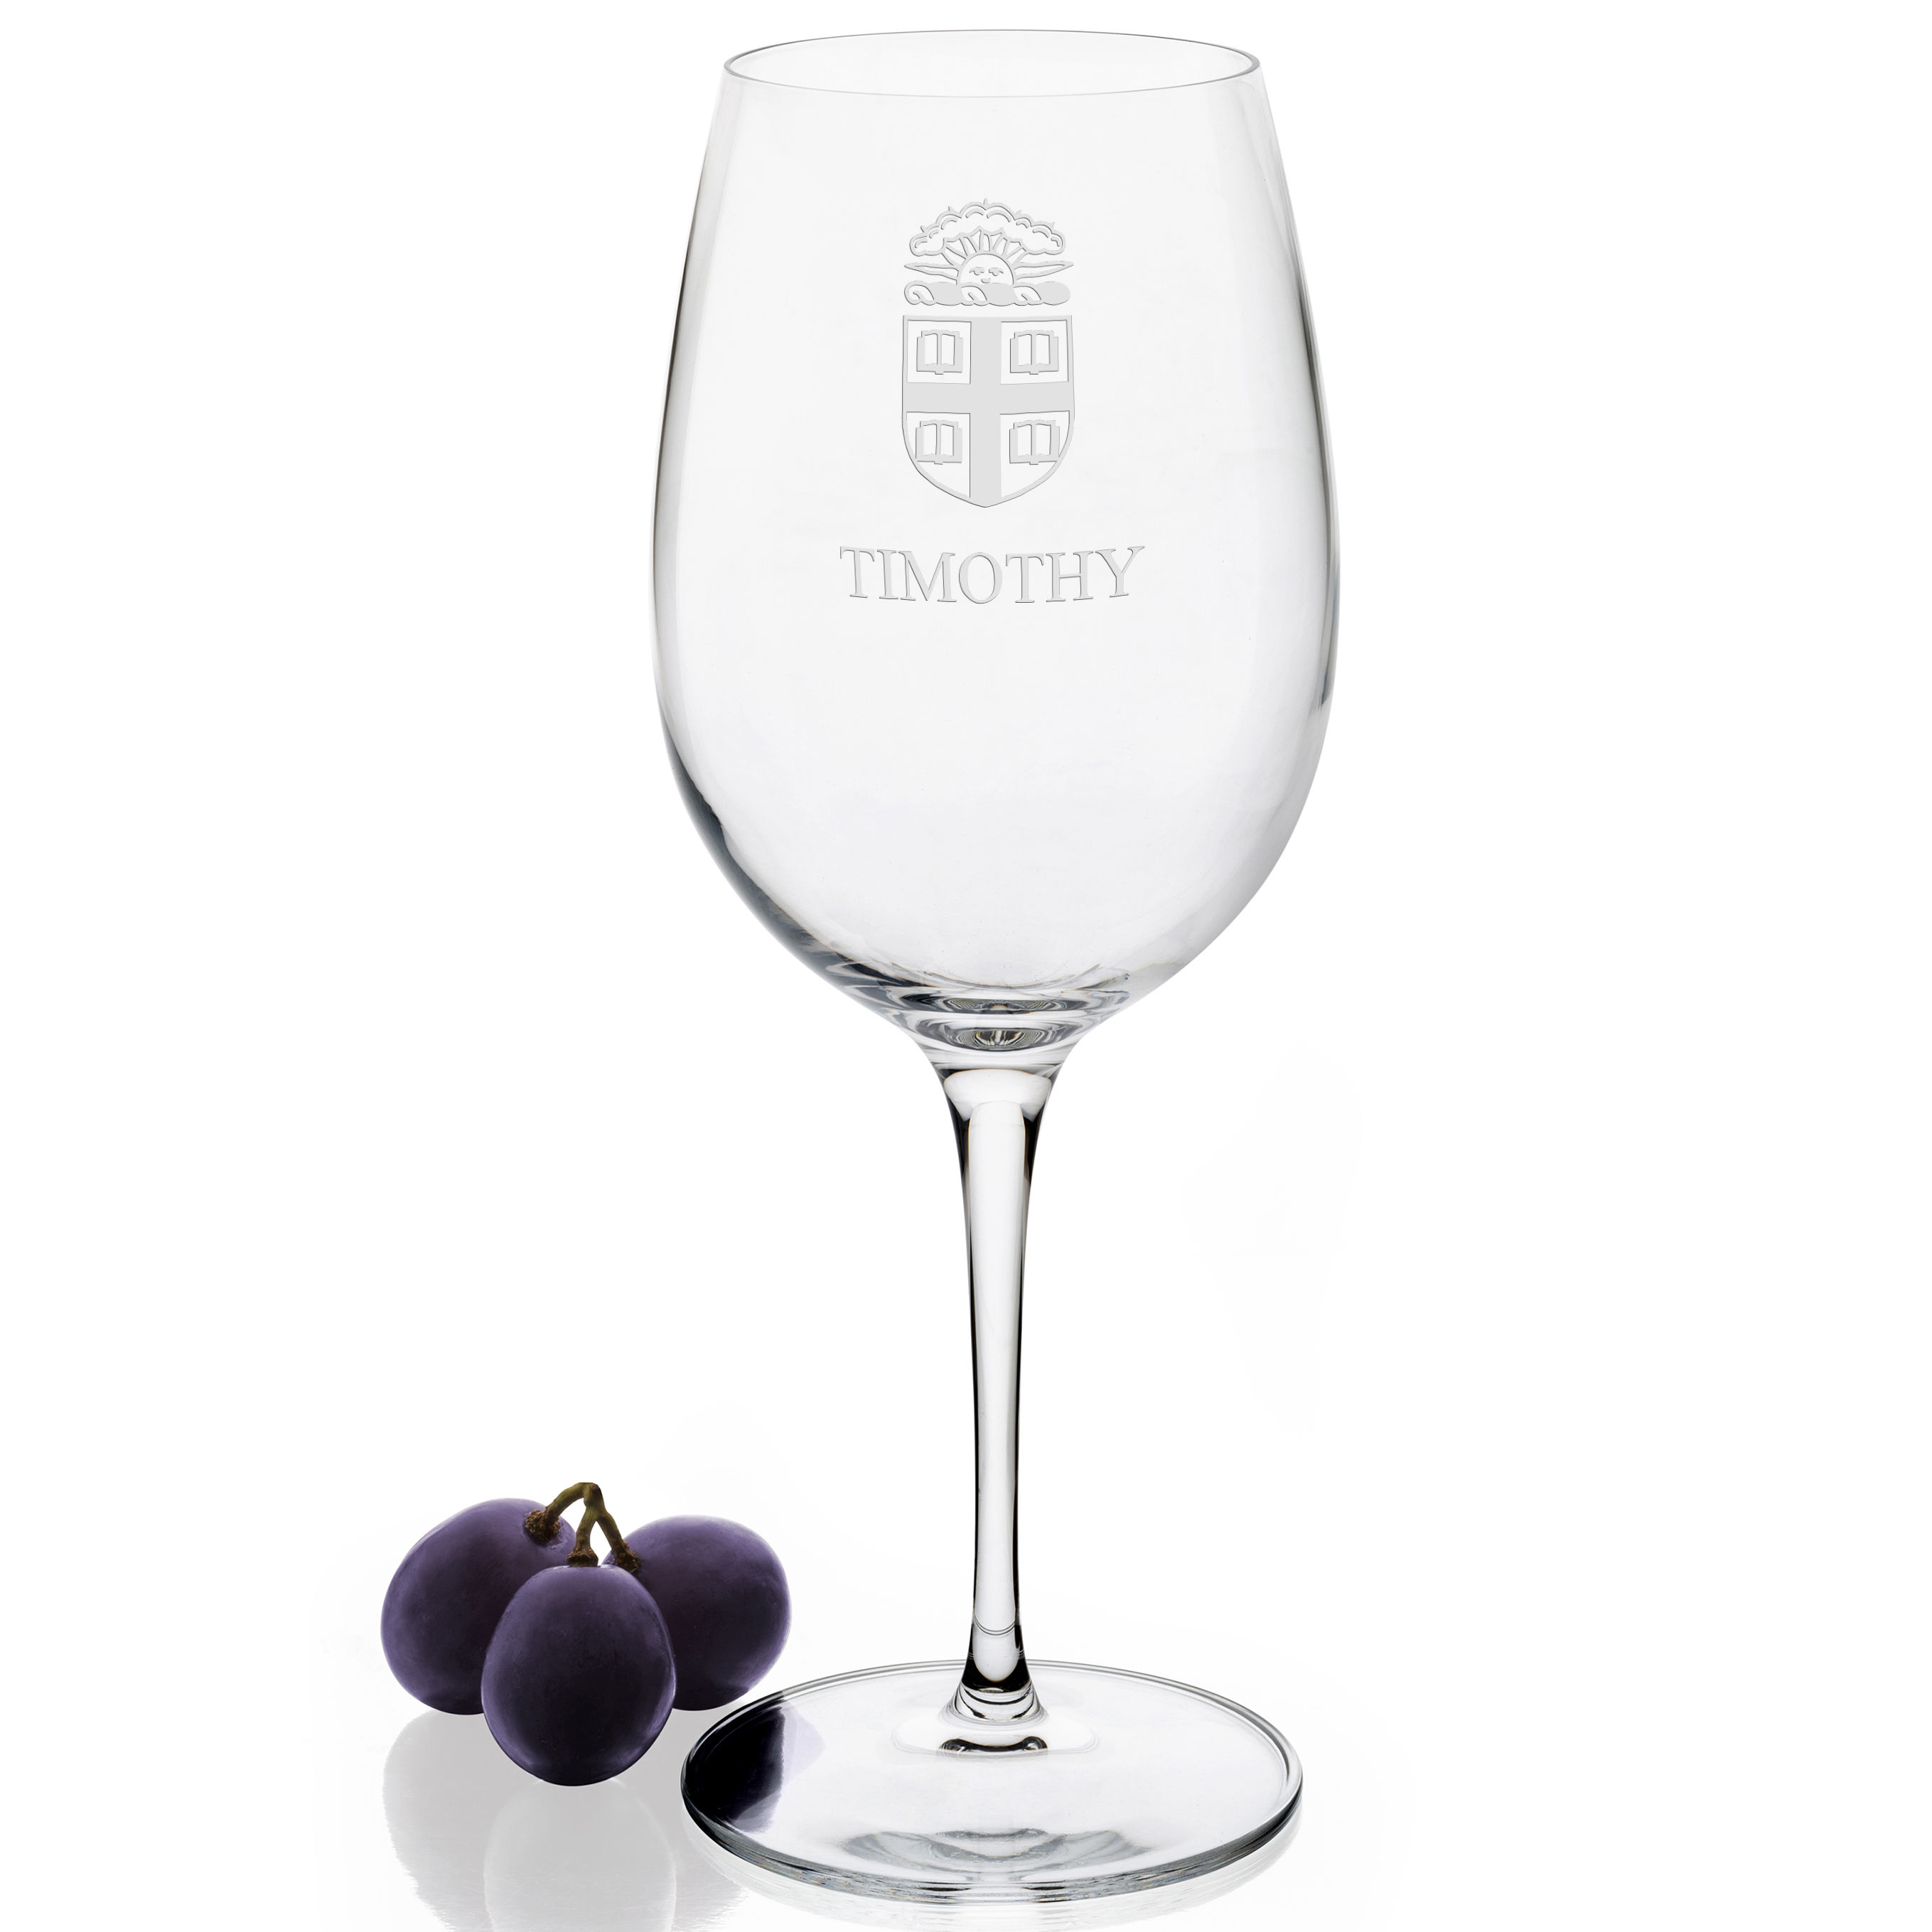 Brown University Red Wine Glasses - Set of 4 - Image 2